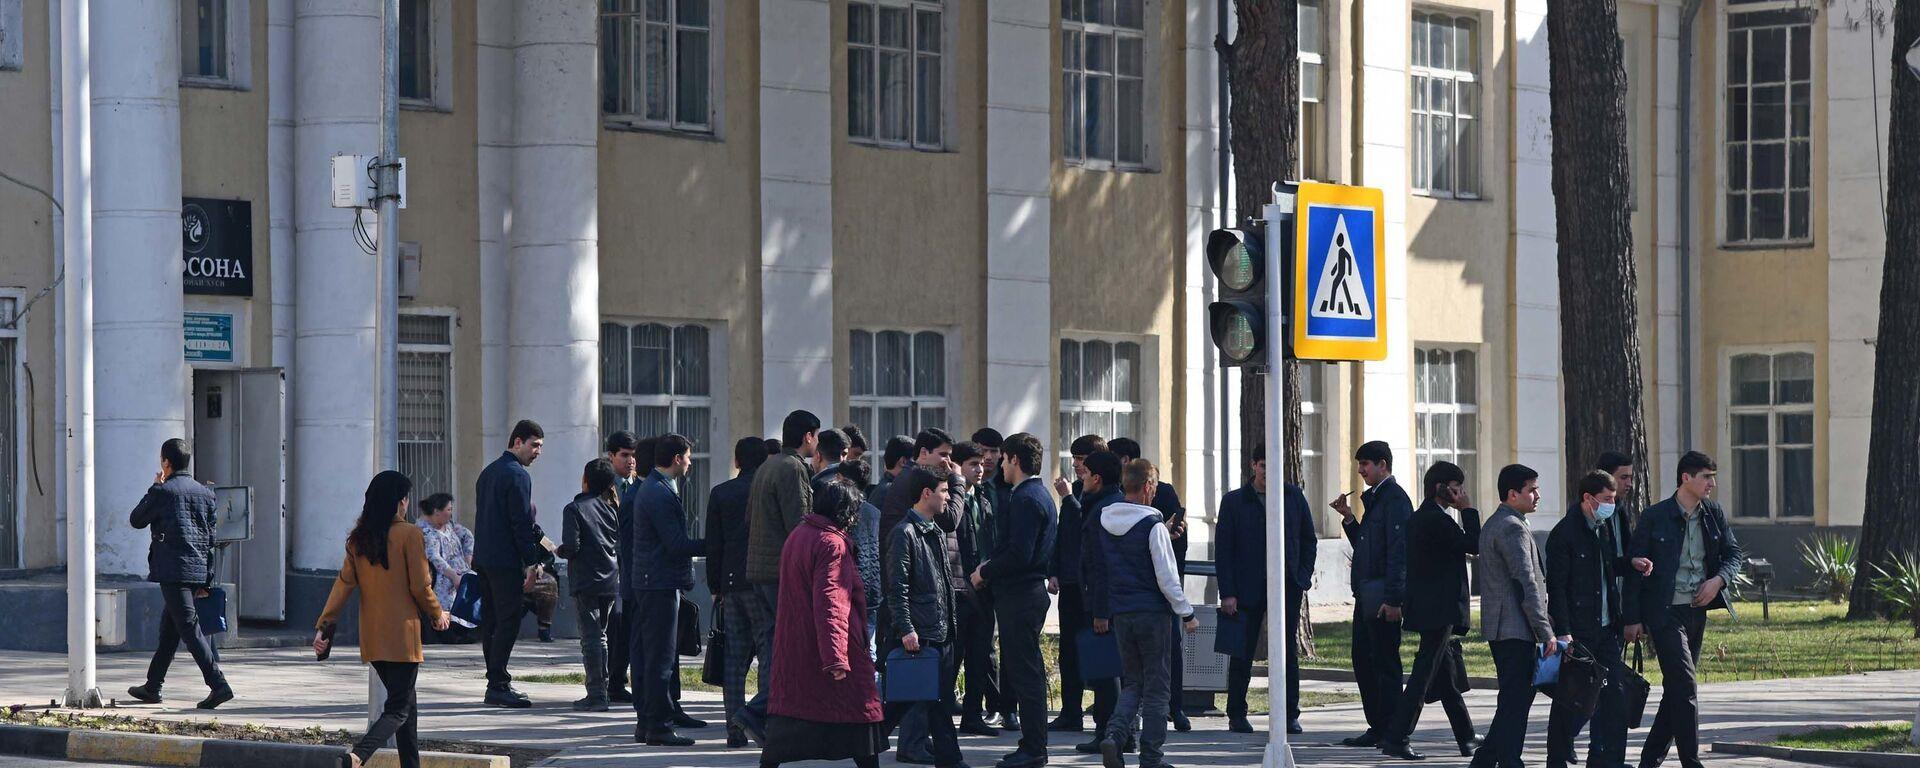 Пешеходы на улице - Sputnik Таджикистан, 1920, 19.02.2021